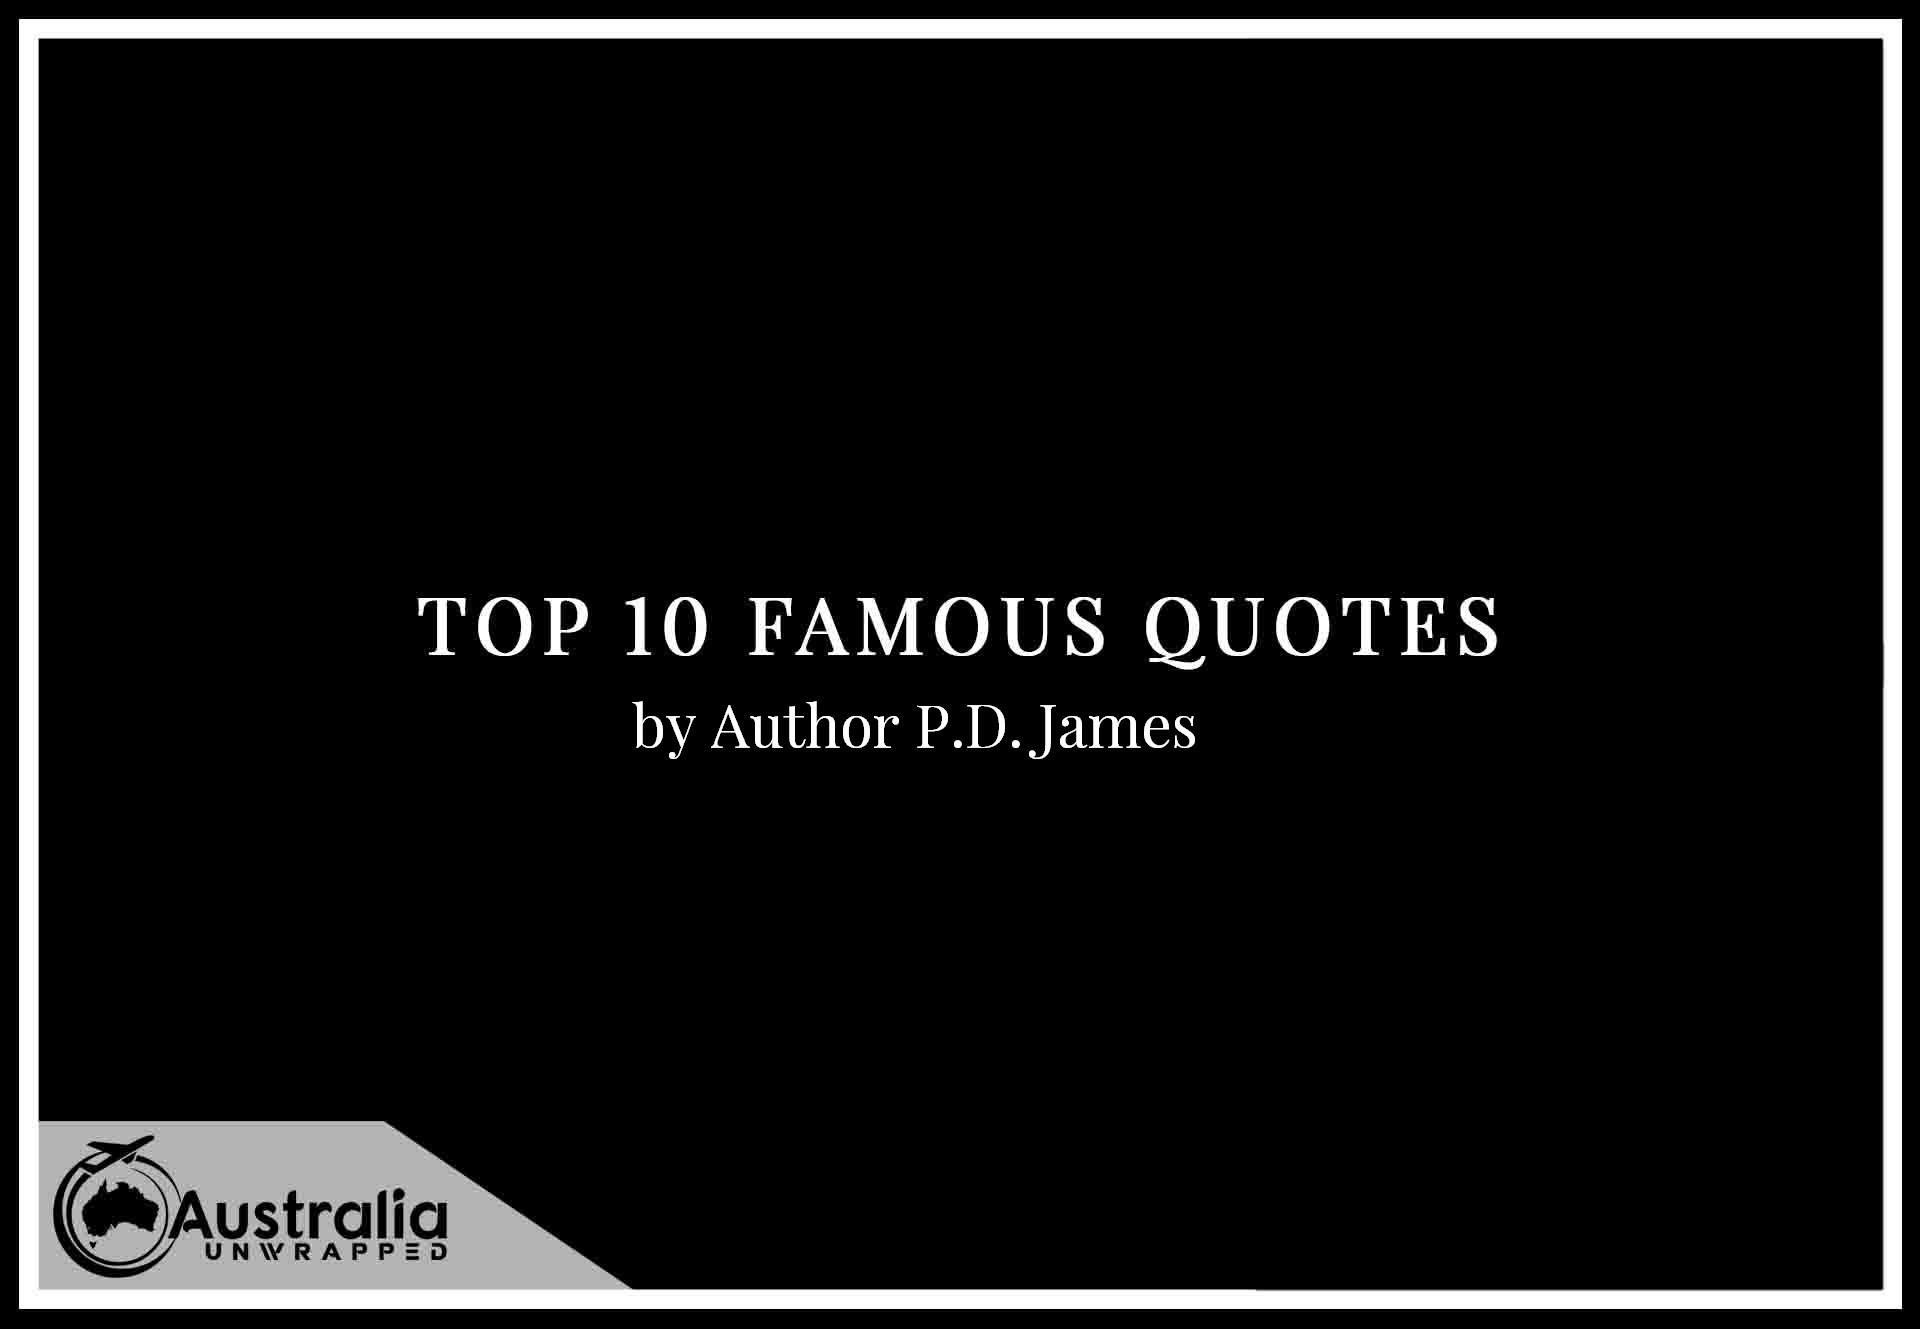 Top 10 Famous Quotes by Author P.D. James